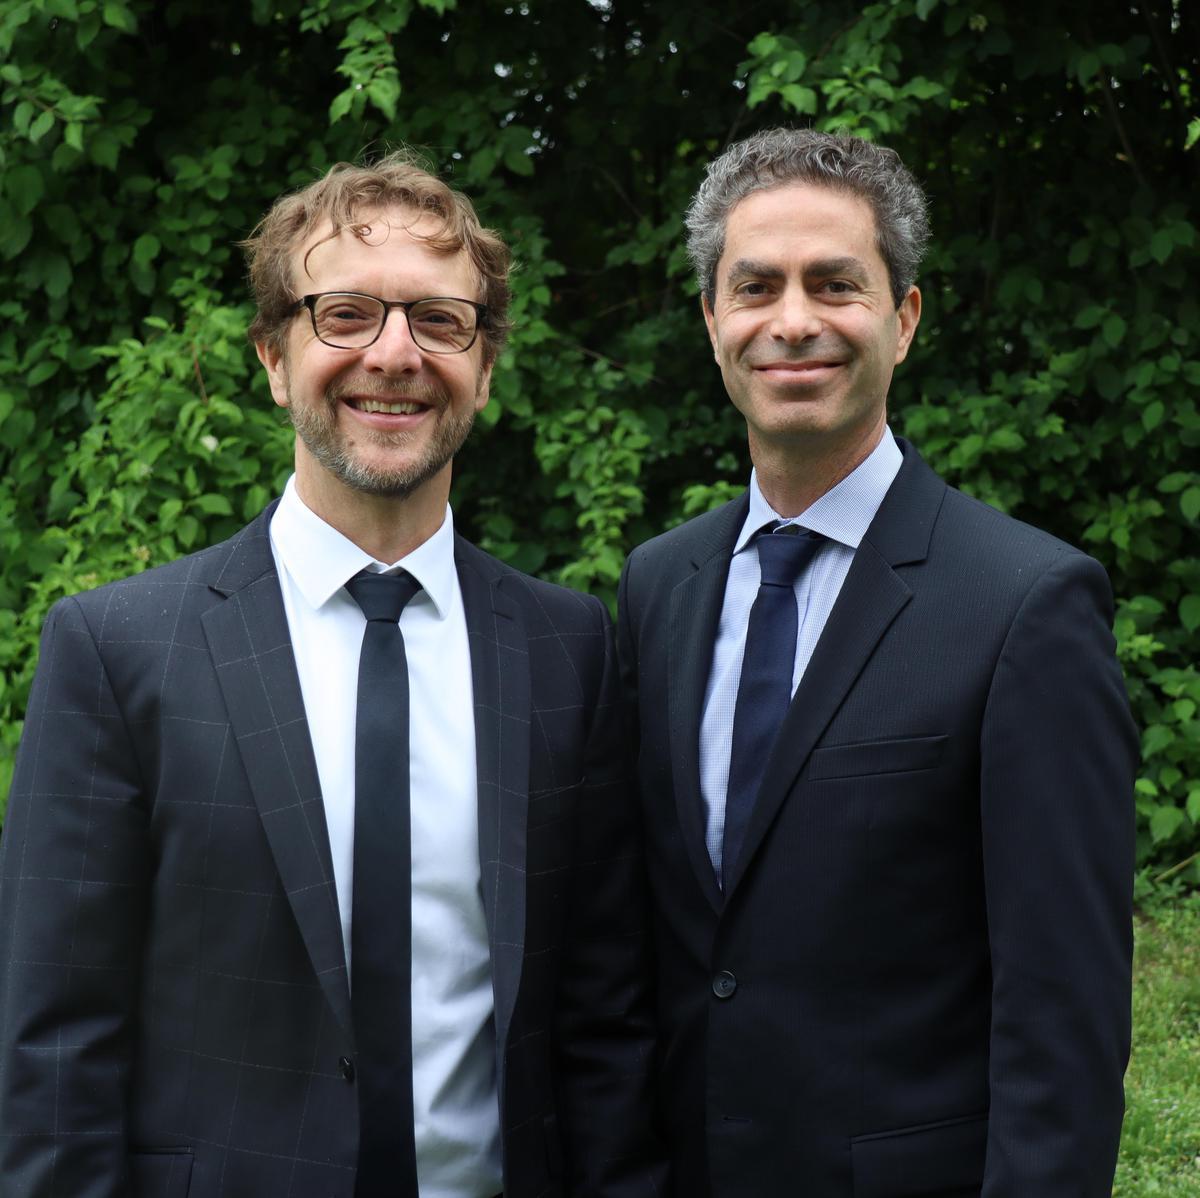 Links Sandro Kriesch und rechts David Michels